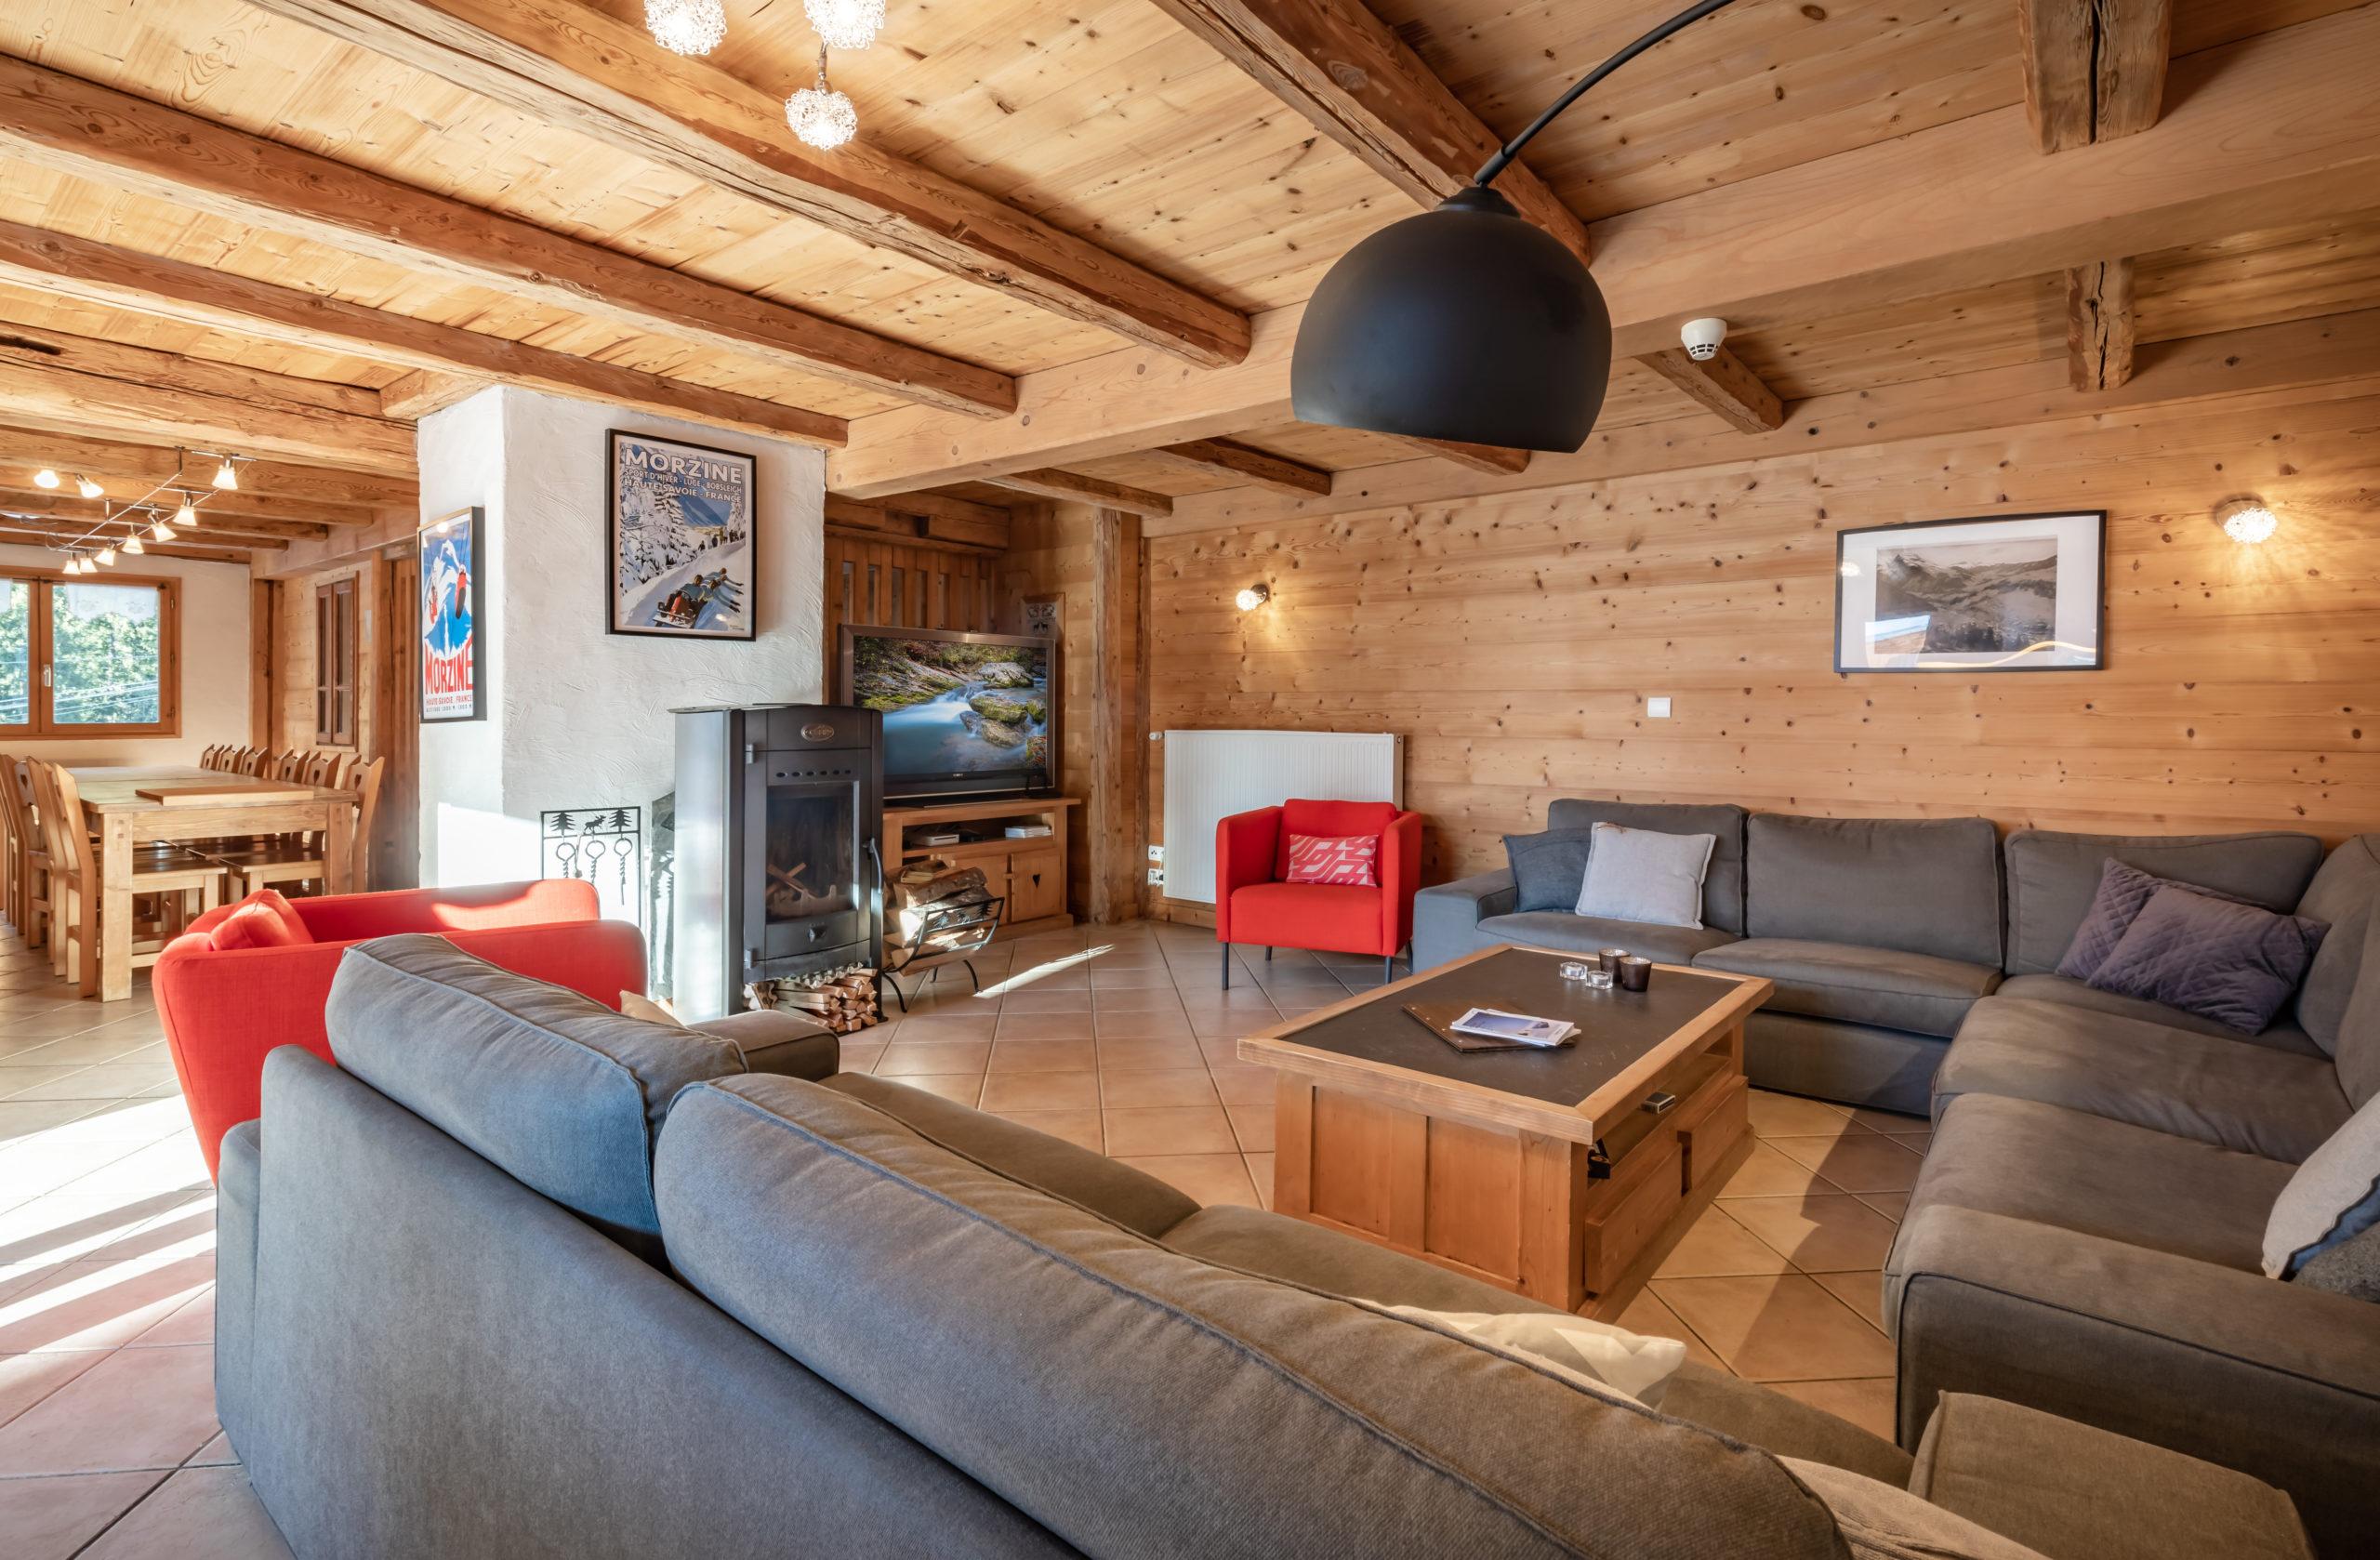 Atelier large open plan lounge and log burner